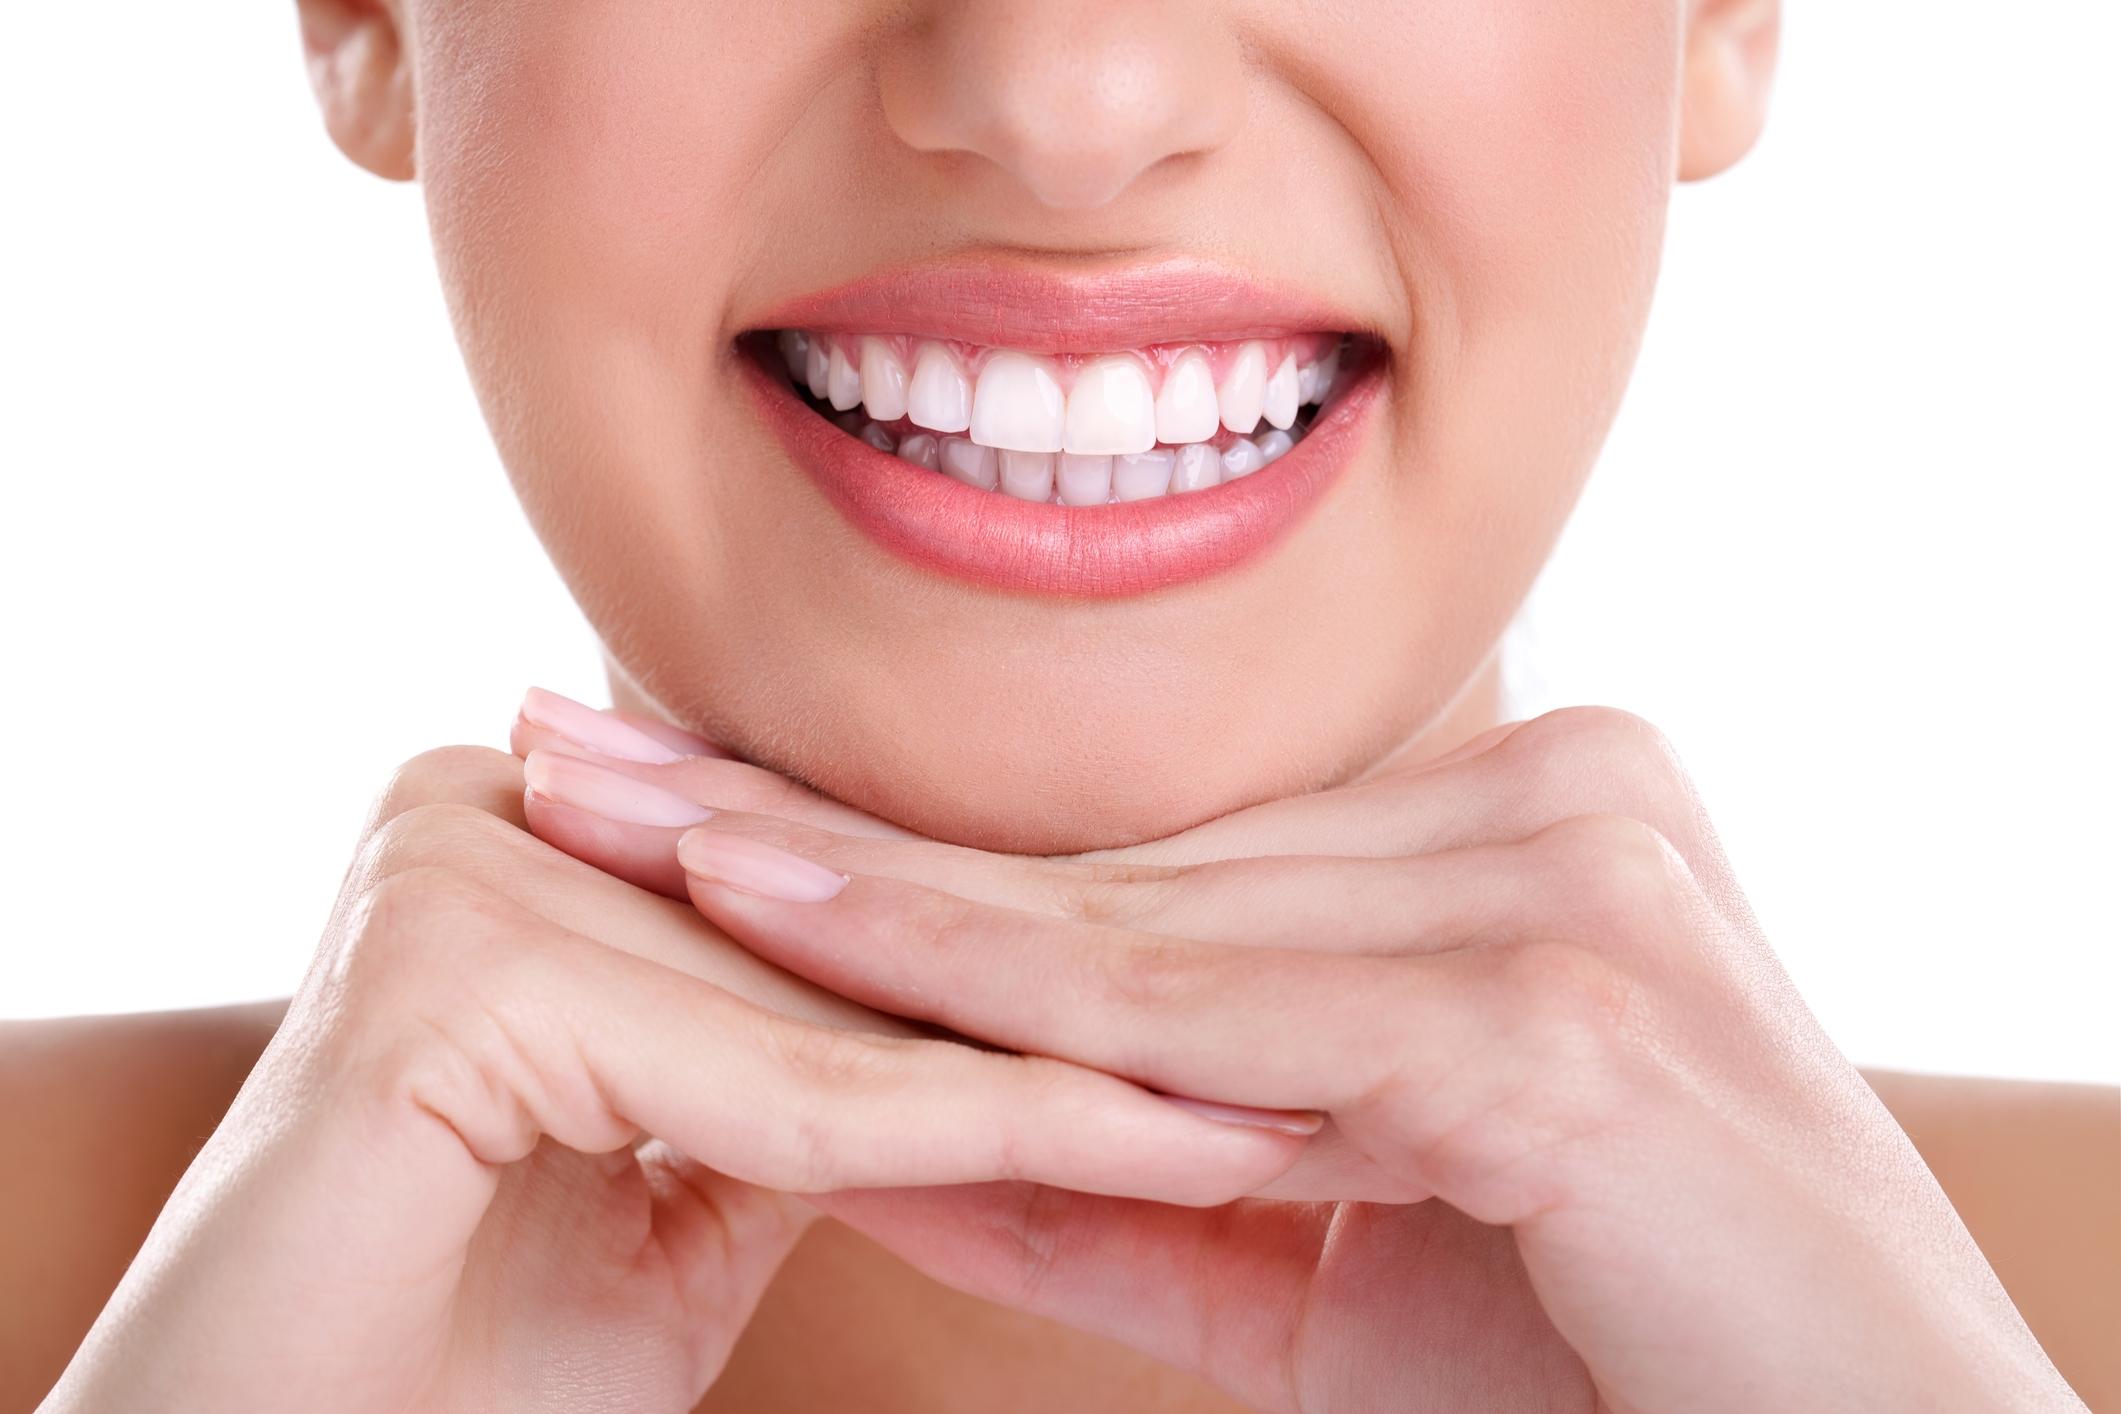 Dental / Vision Insurance